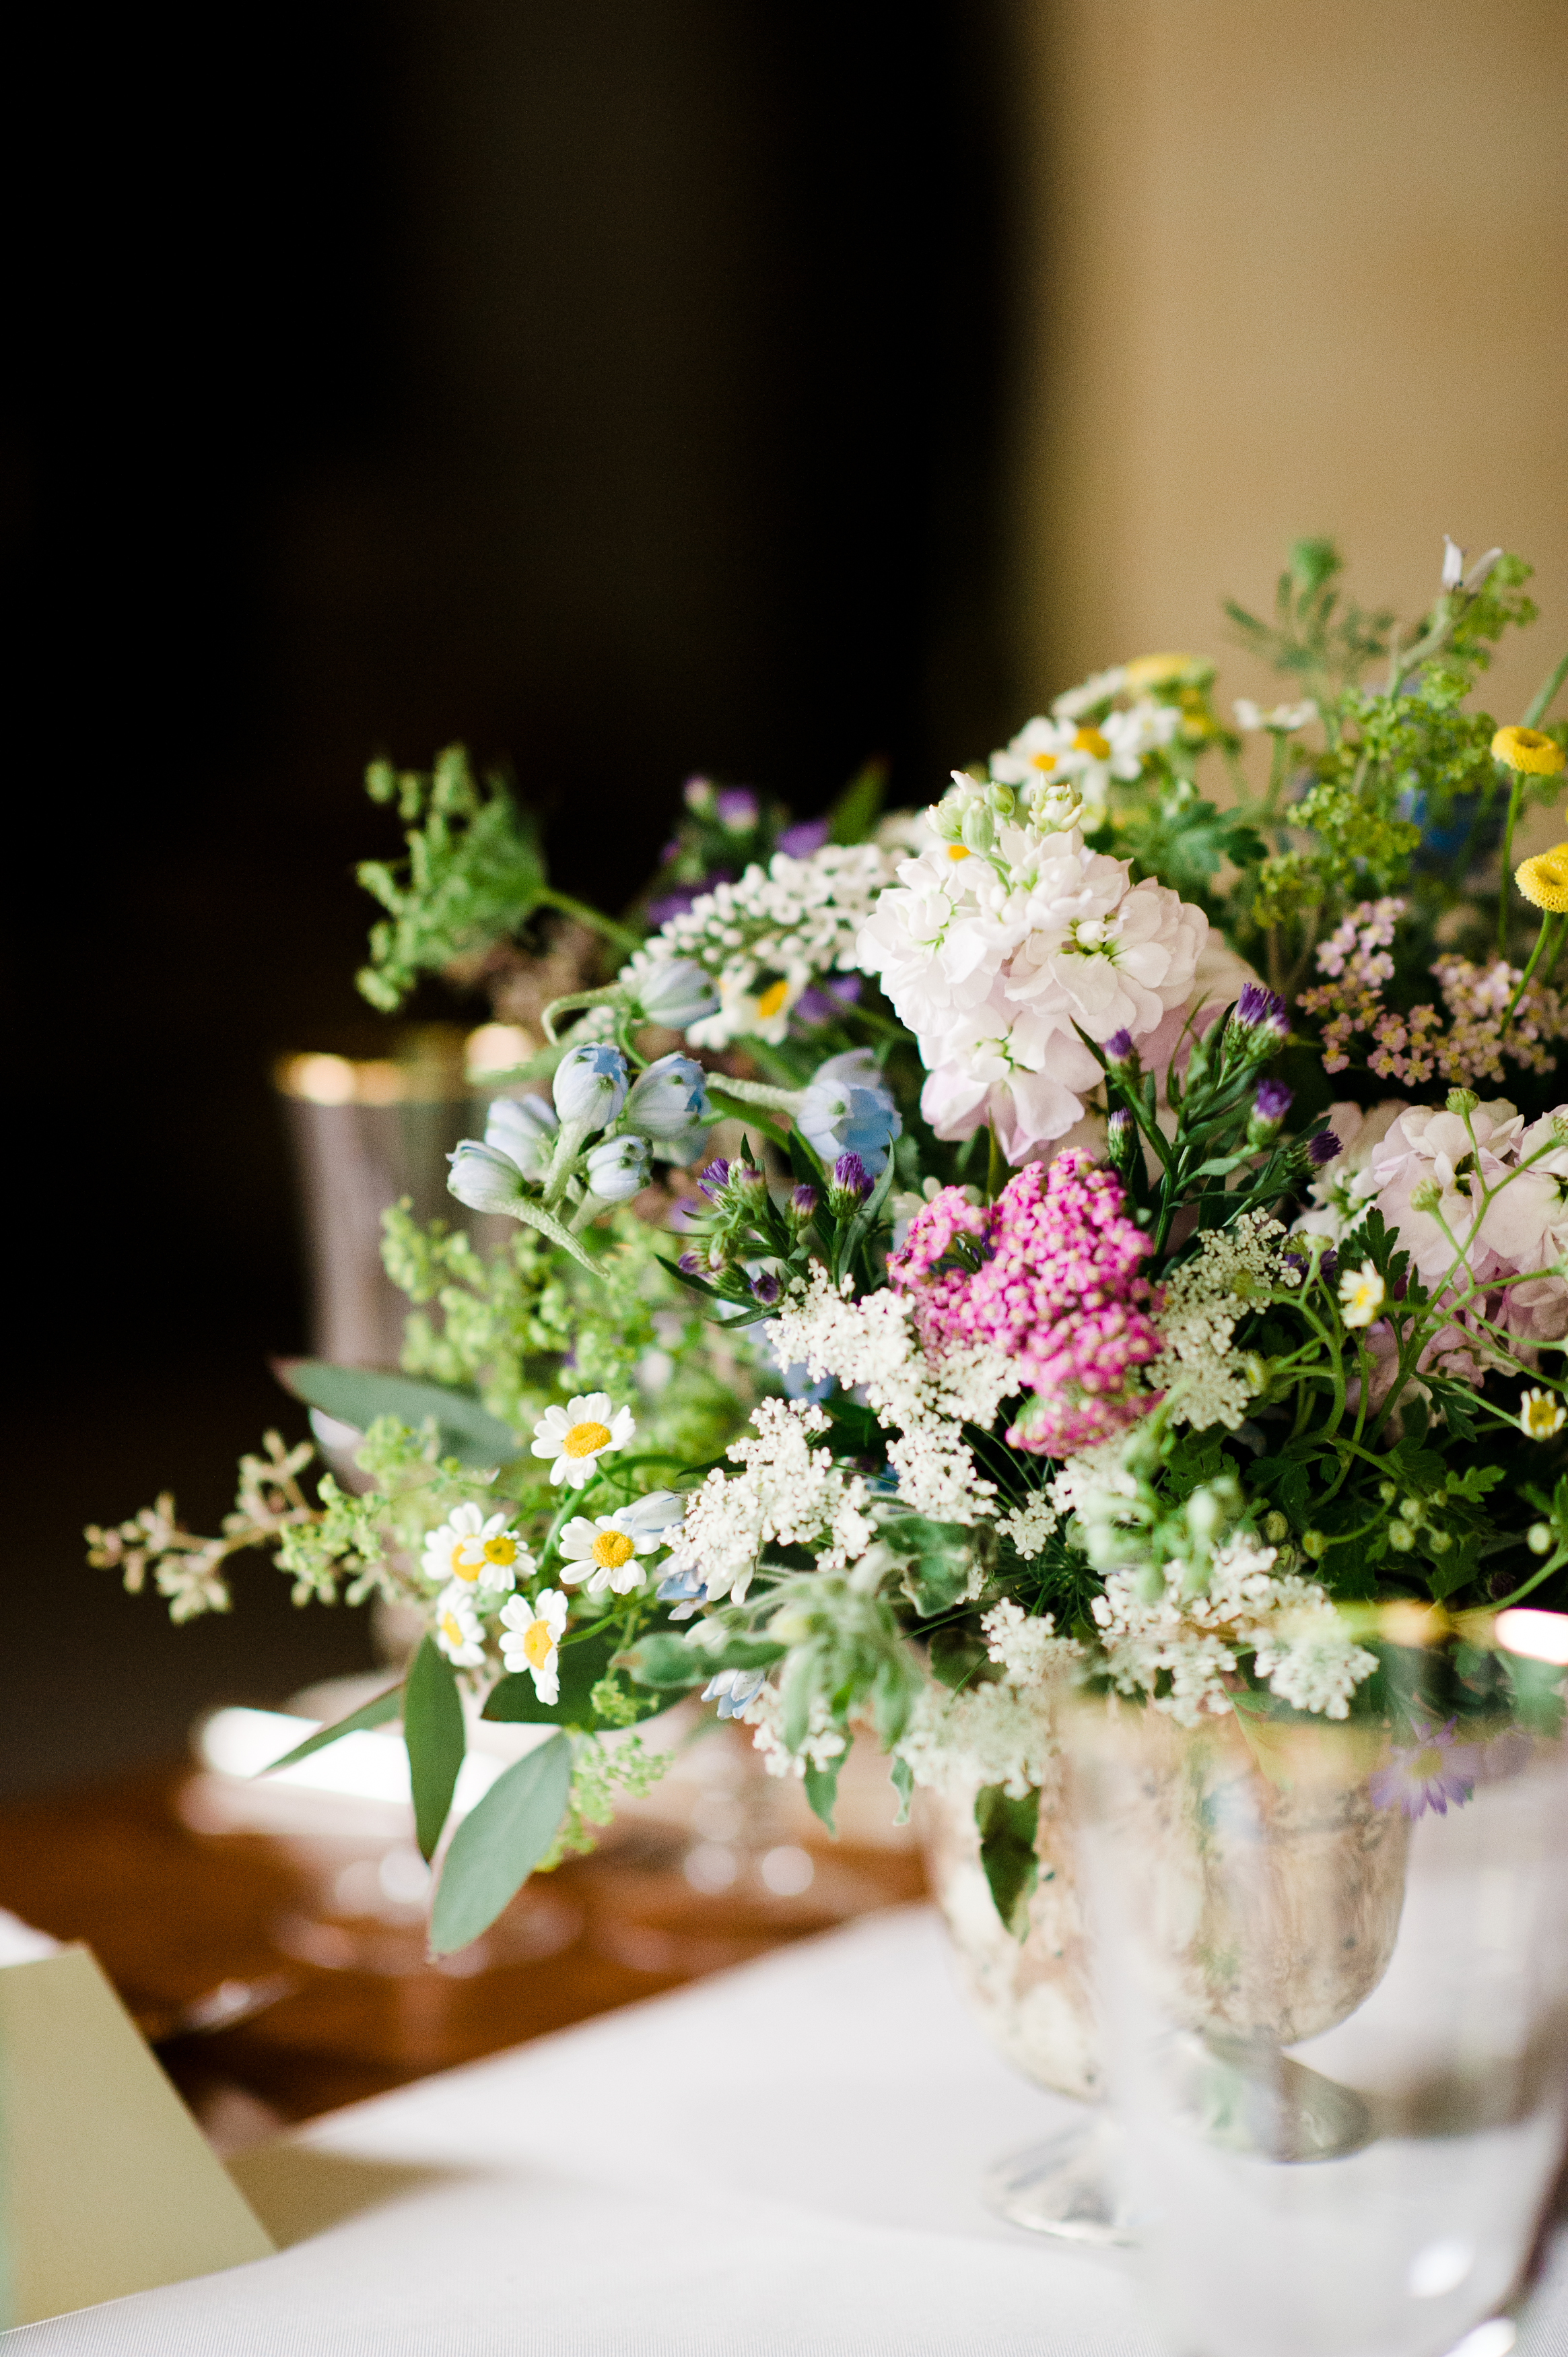 sumer tom connecticut wedding wedding flowers decor klw design. Black Bedroom Furniture Sets. Home Design Ideas